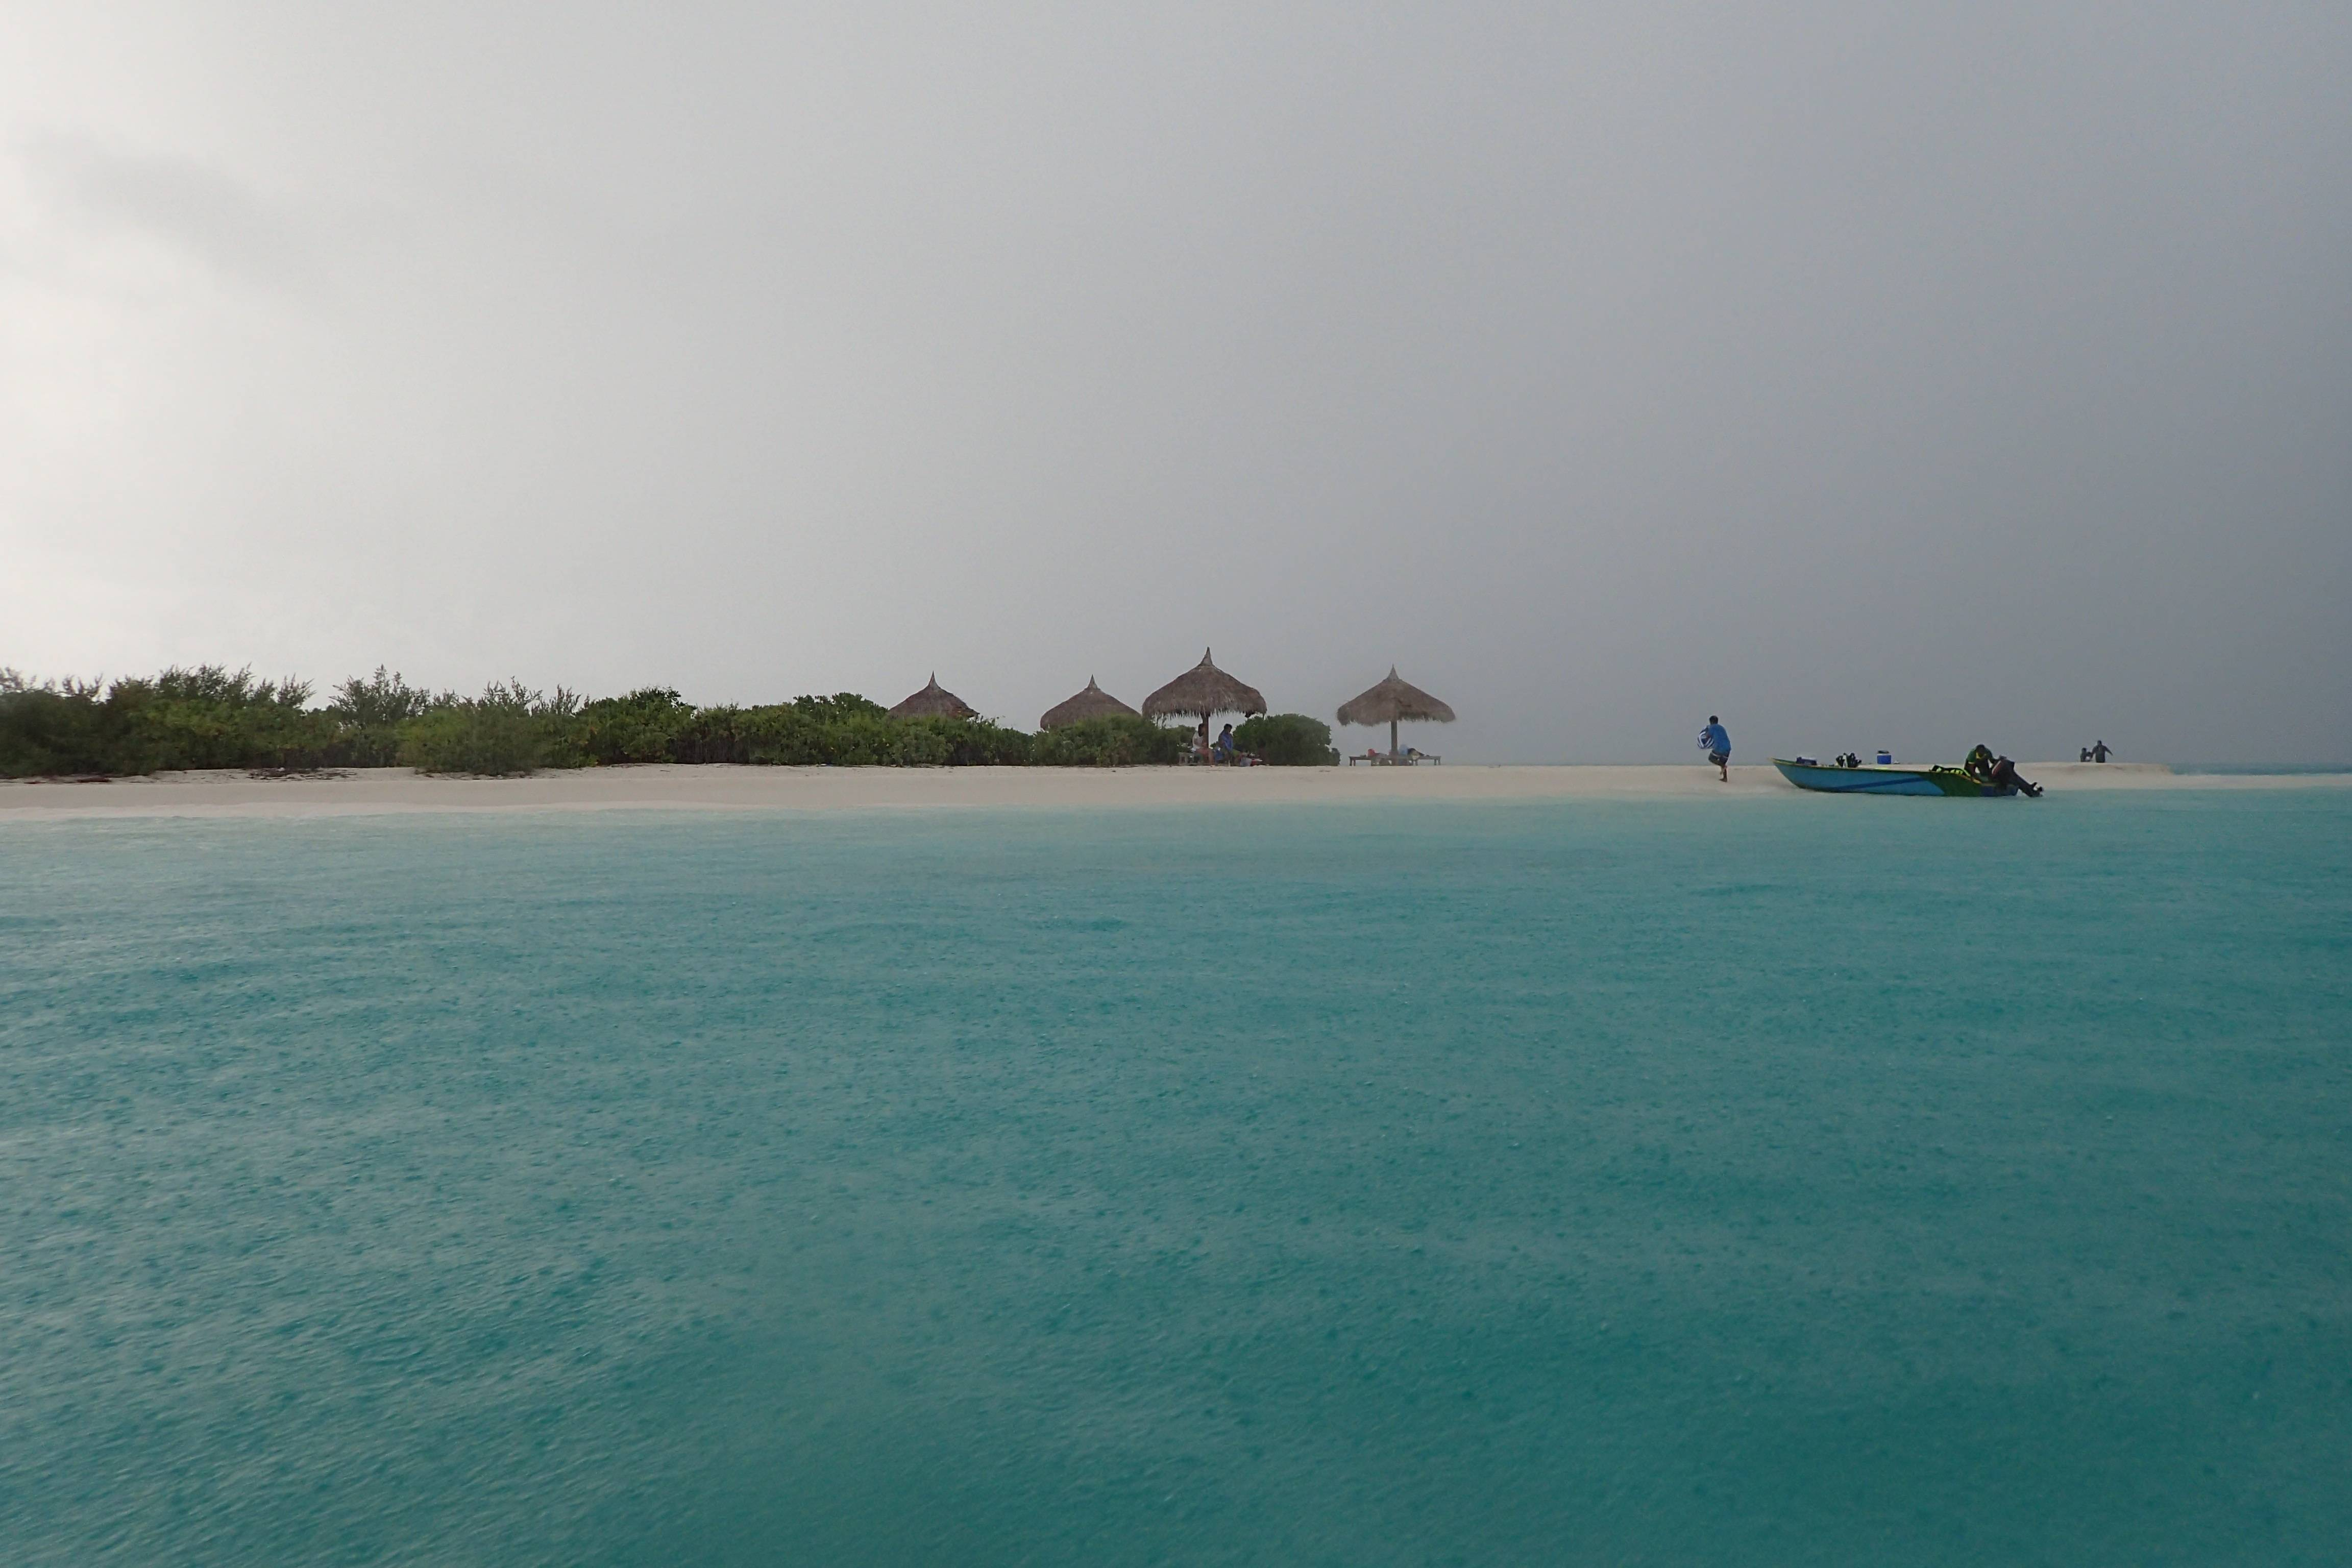 It was raining in Sandbank Island.